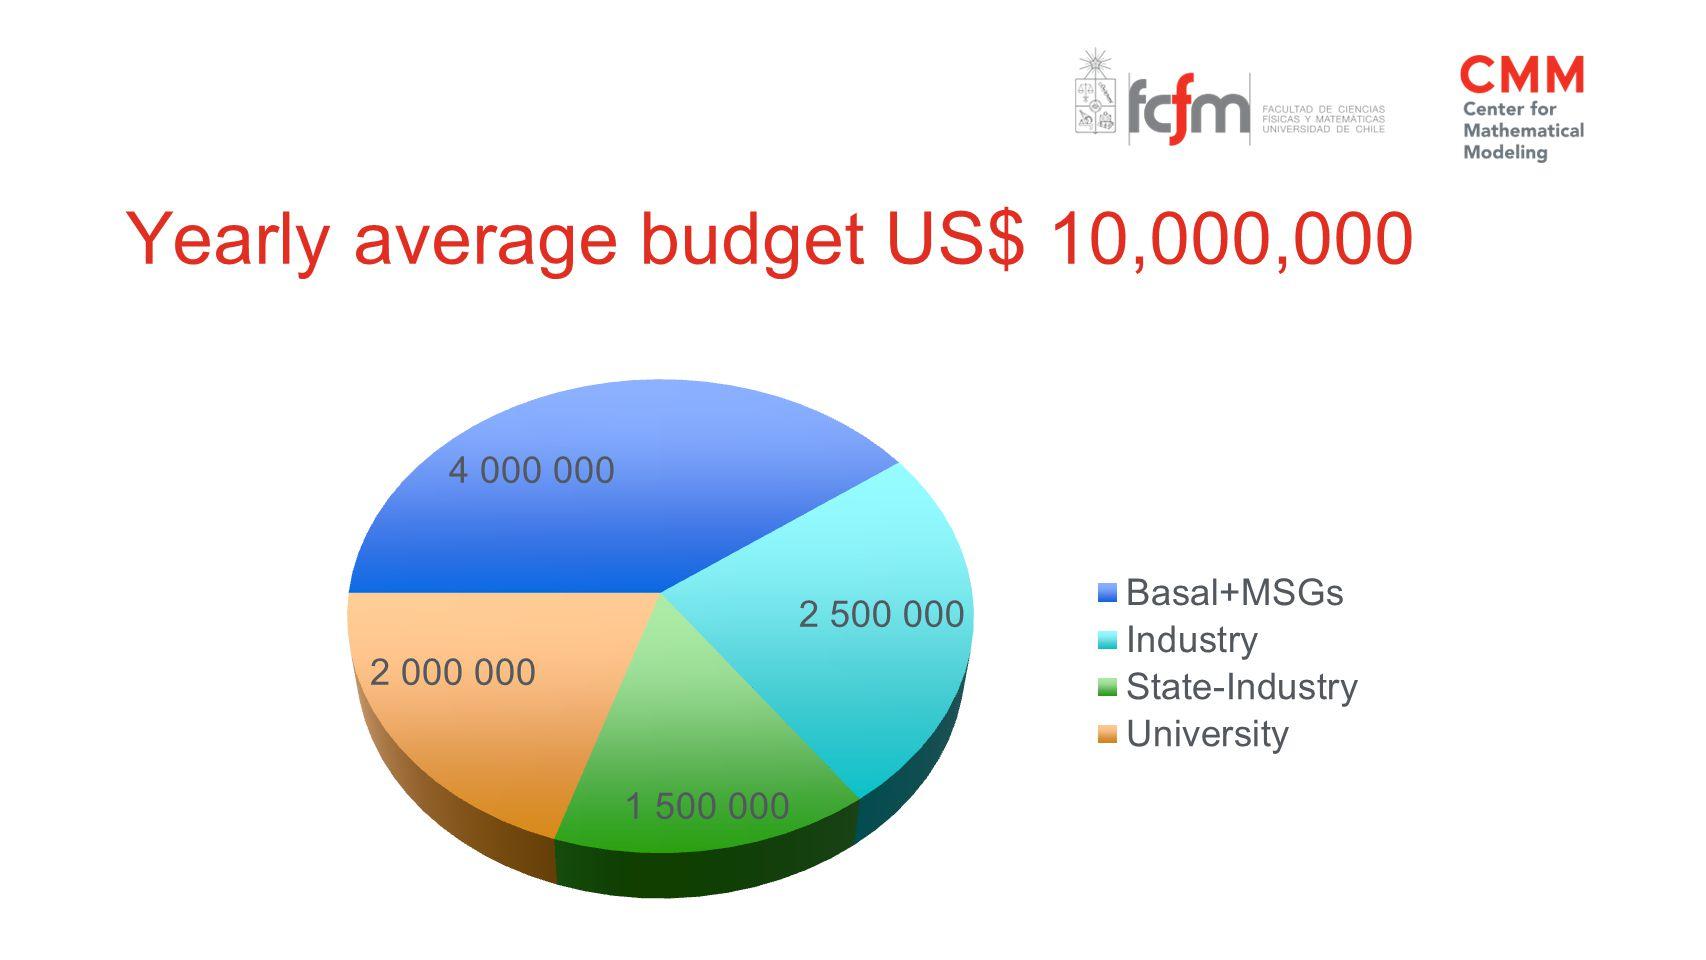 Yearly average budget US$ 10,000,000